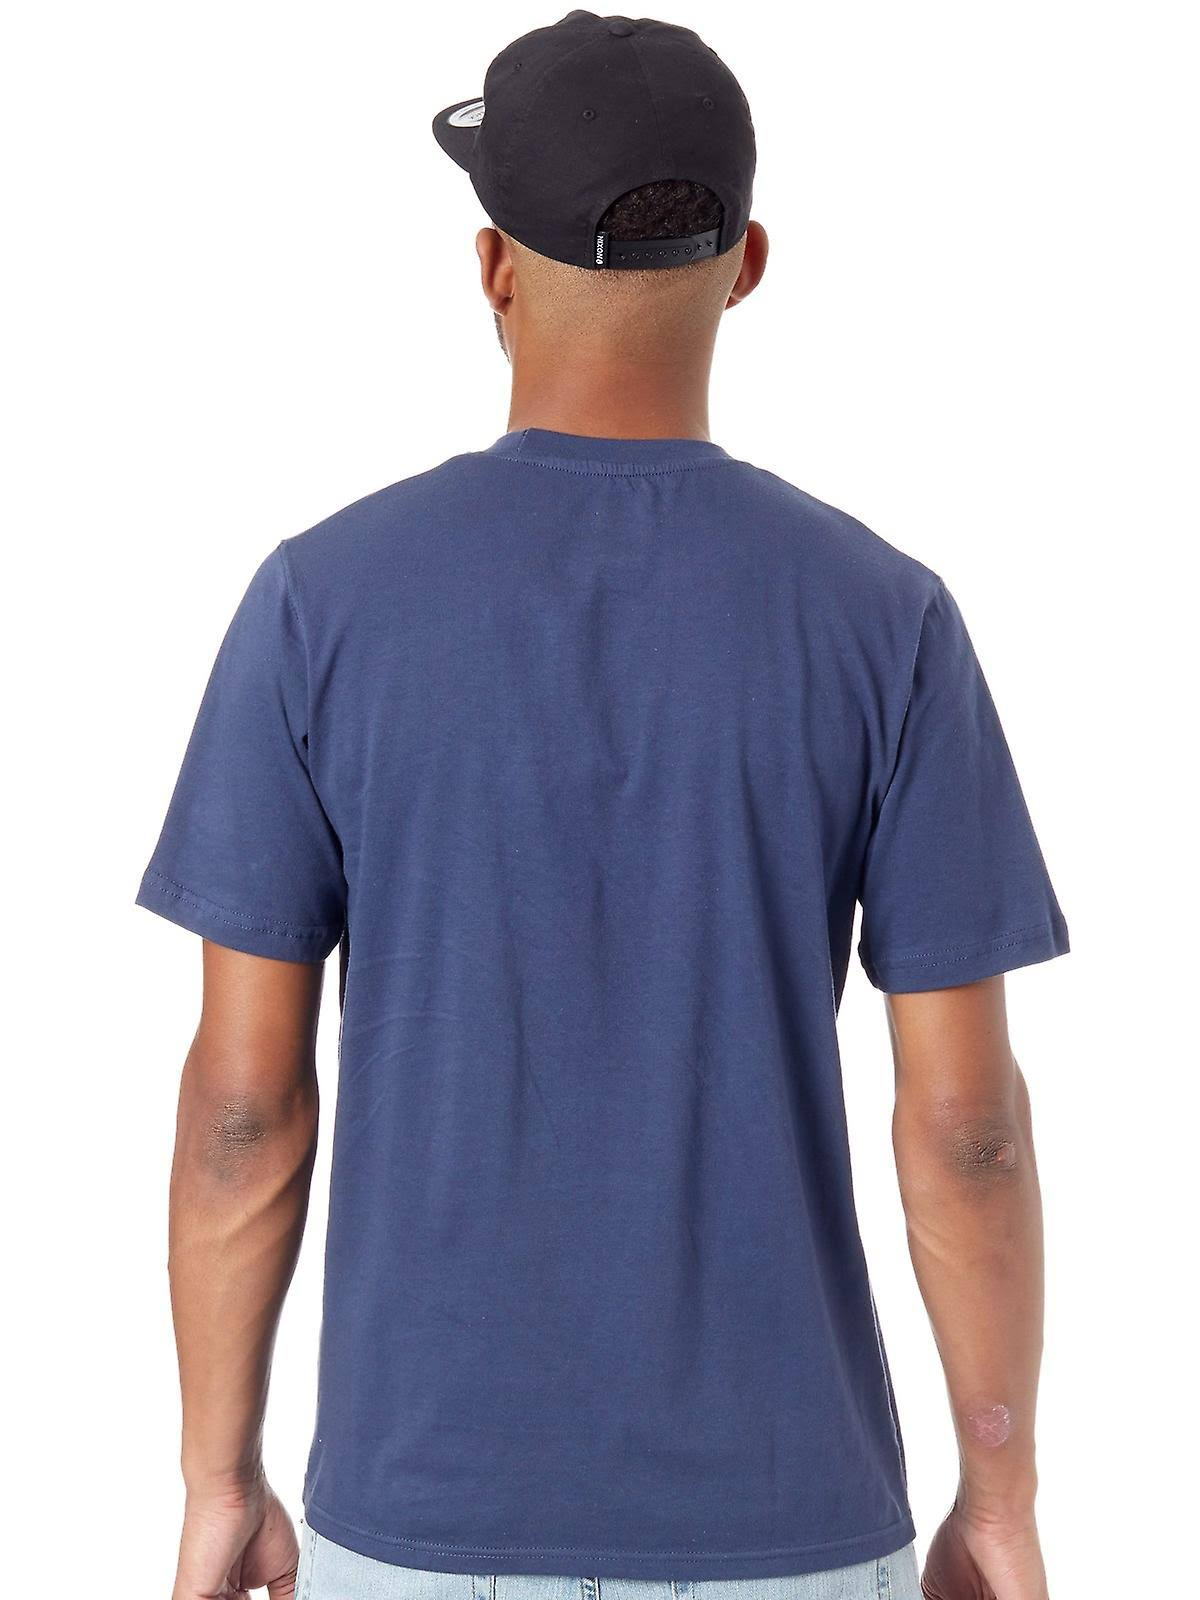 Marineblau shirt Hufeisen Dickies Azul L T PxvnpHw